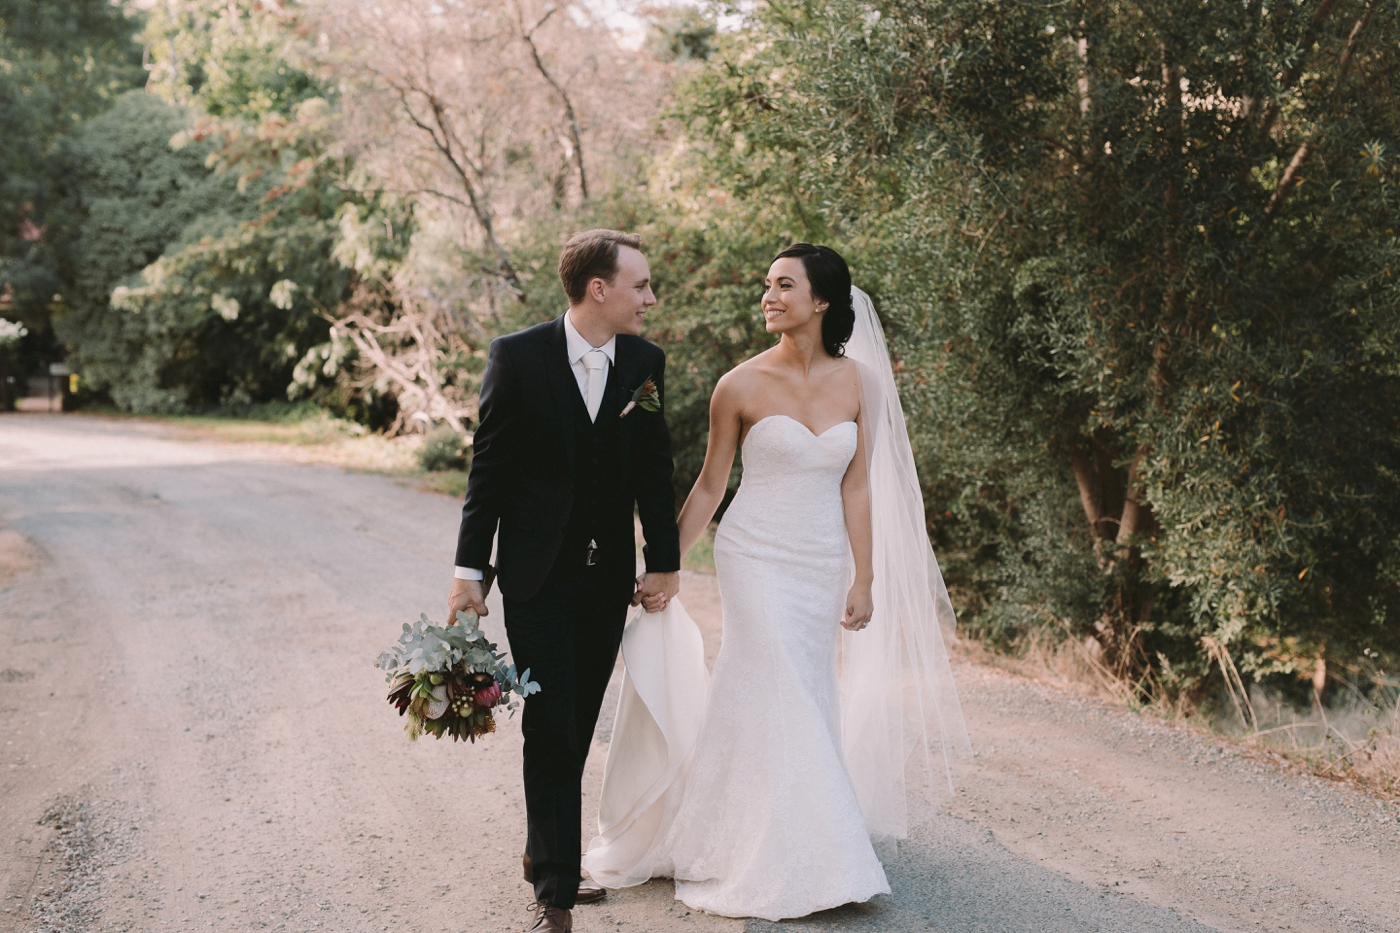 Jasmine and Adam - Natural wedding photographer in Adelaide - Candid Wedding Photographer Adelaide - www.katherineschultzphotography.com